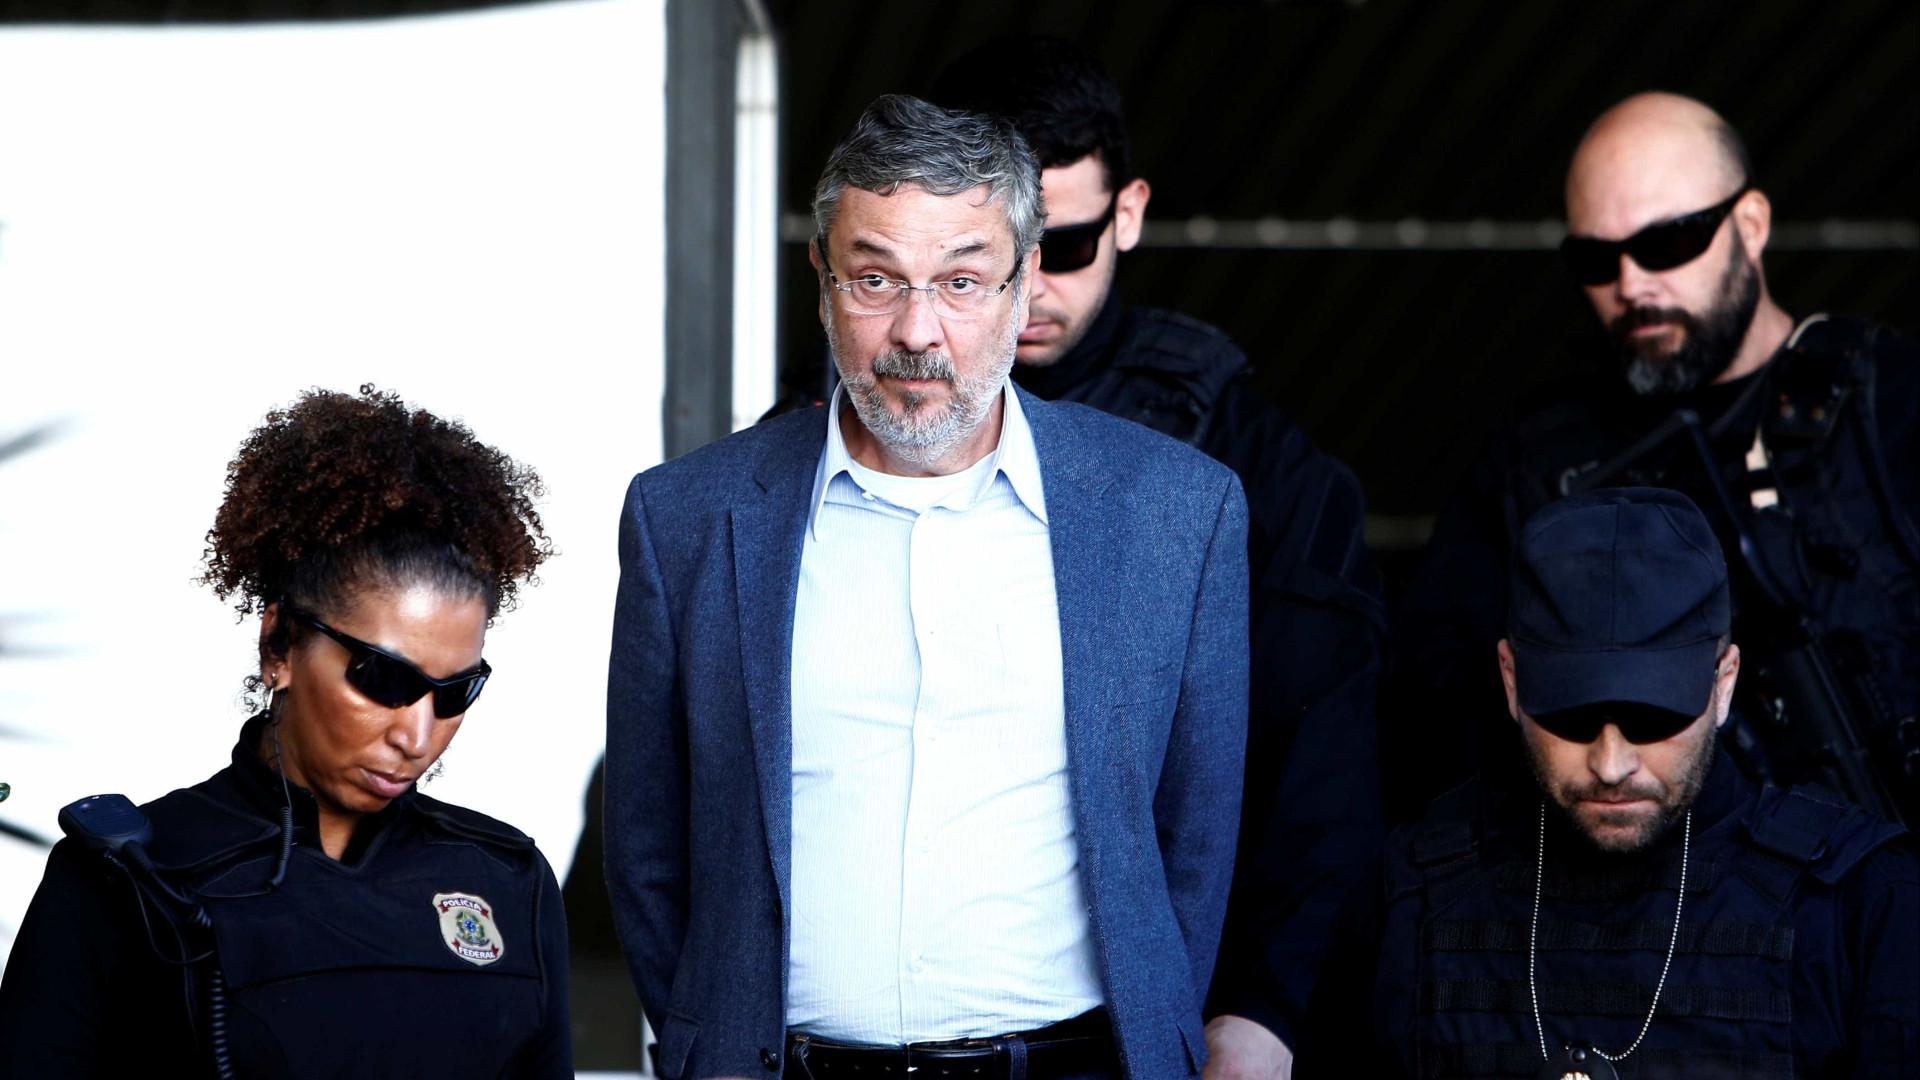 Palocci diz que Lula sabia que seria alvo de fase da Lava Jato